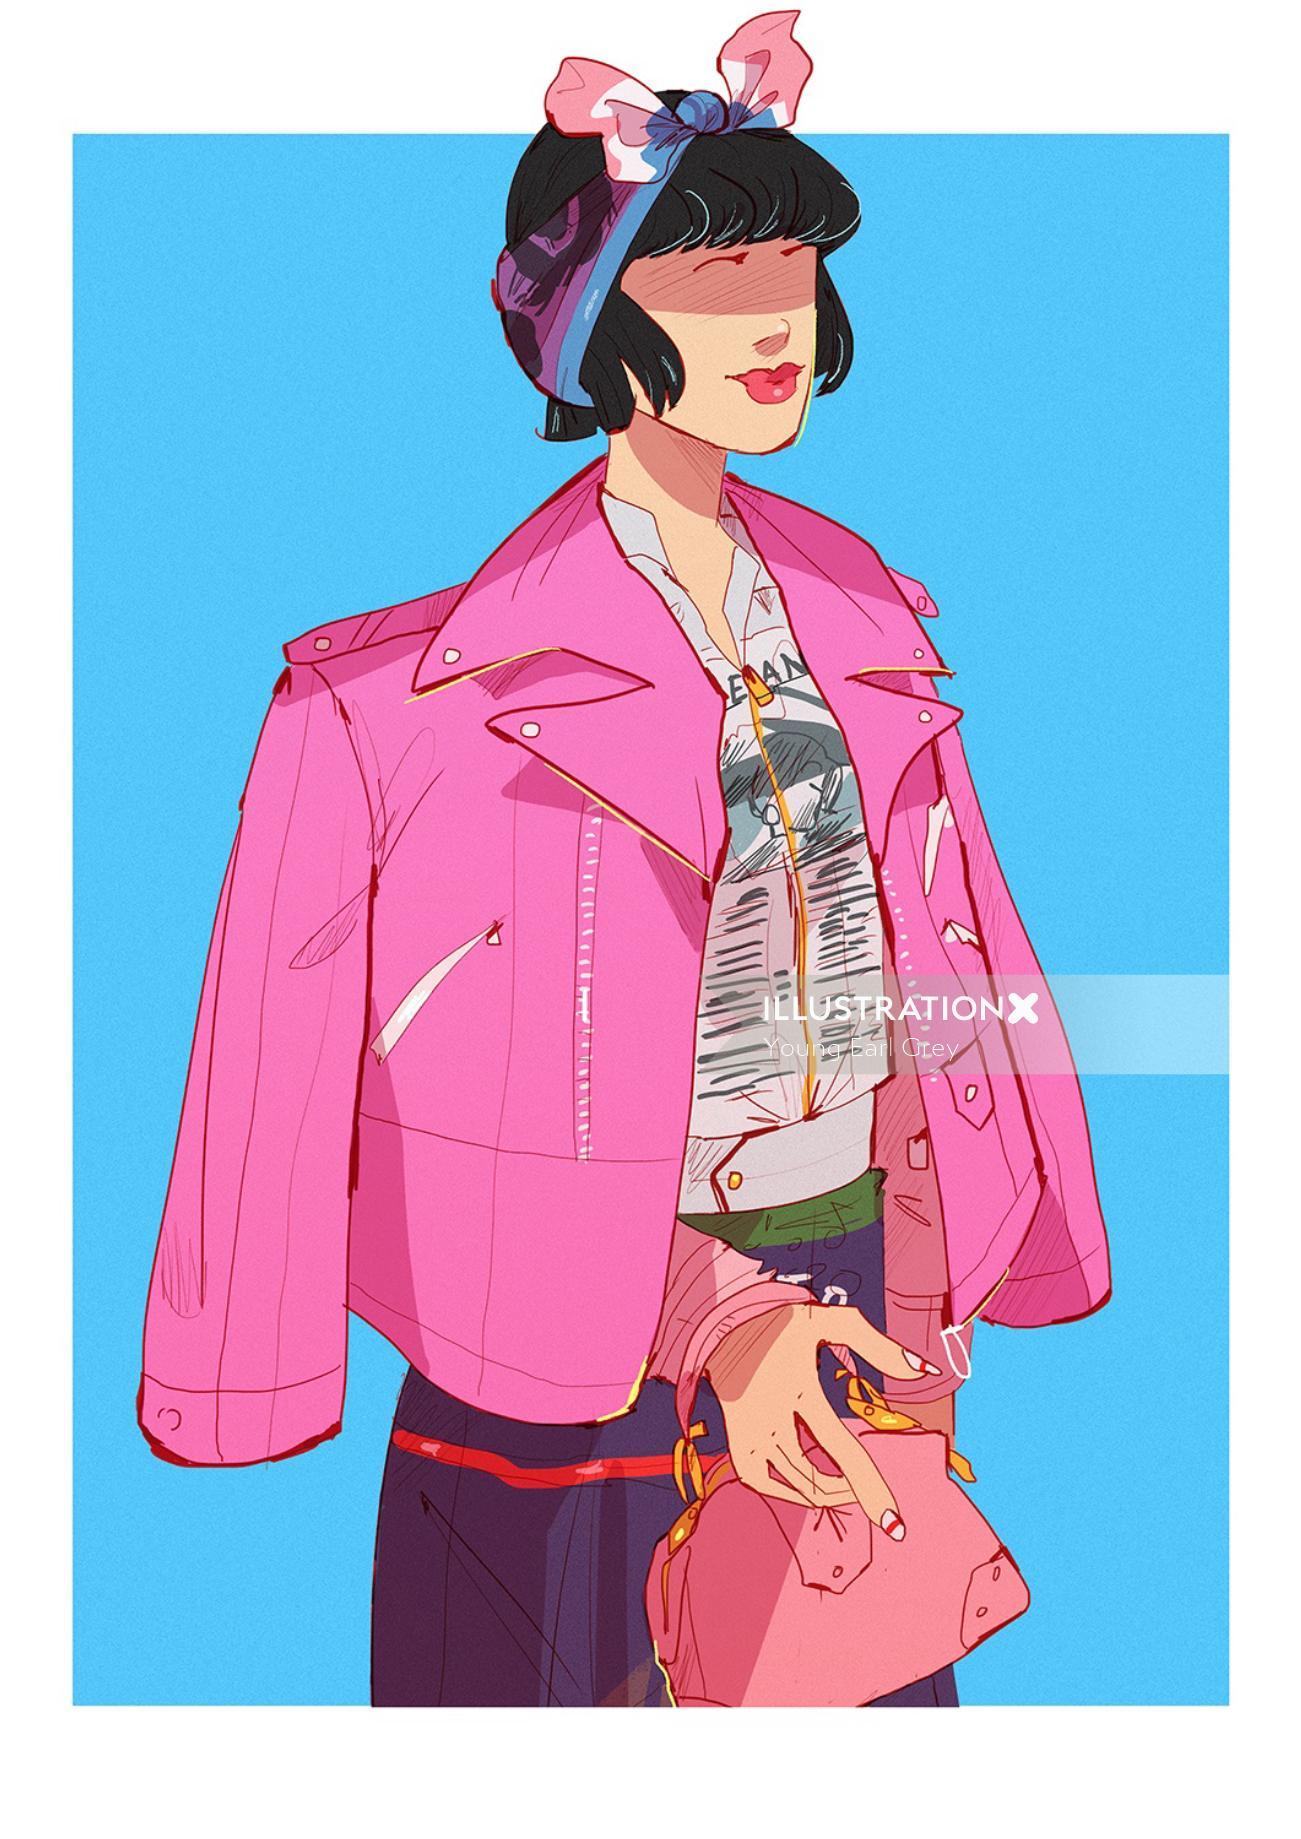 Retro fashion illustration of a lady